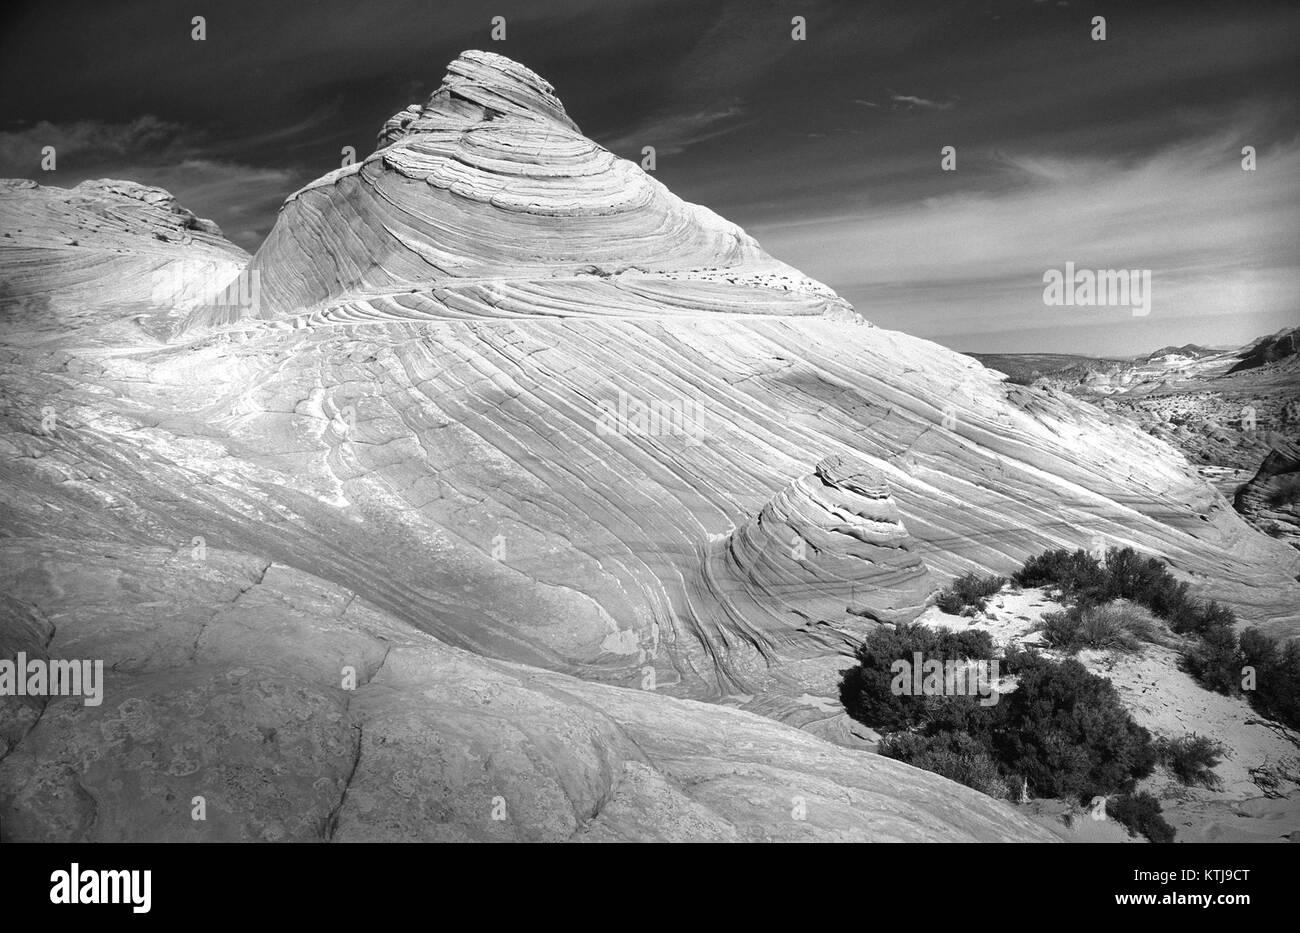 AZ   The Wave, Paria Canyon Wilderness, Mar 1987  BW (1) (10469004234) - Stock Image